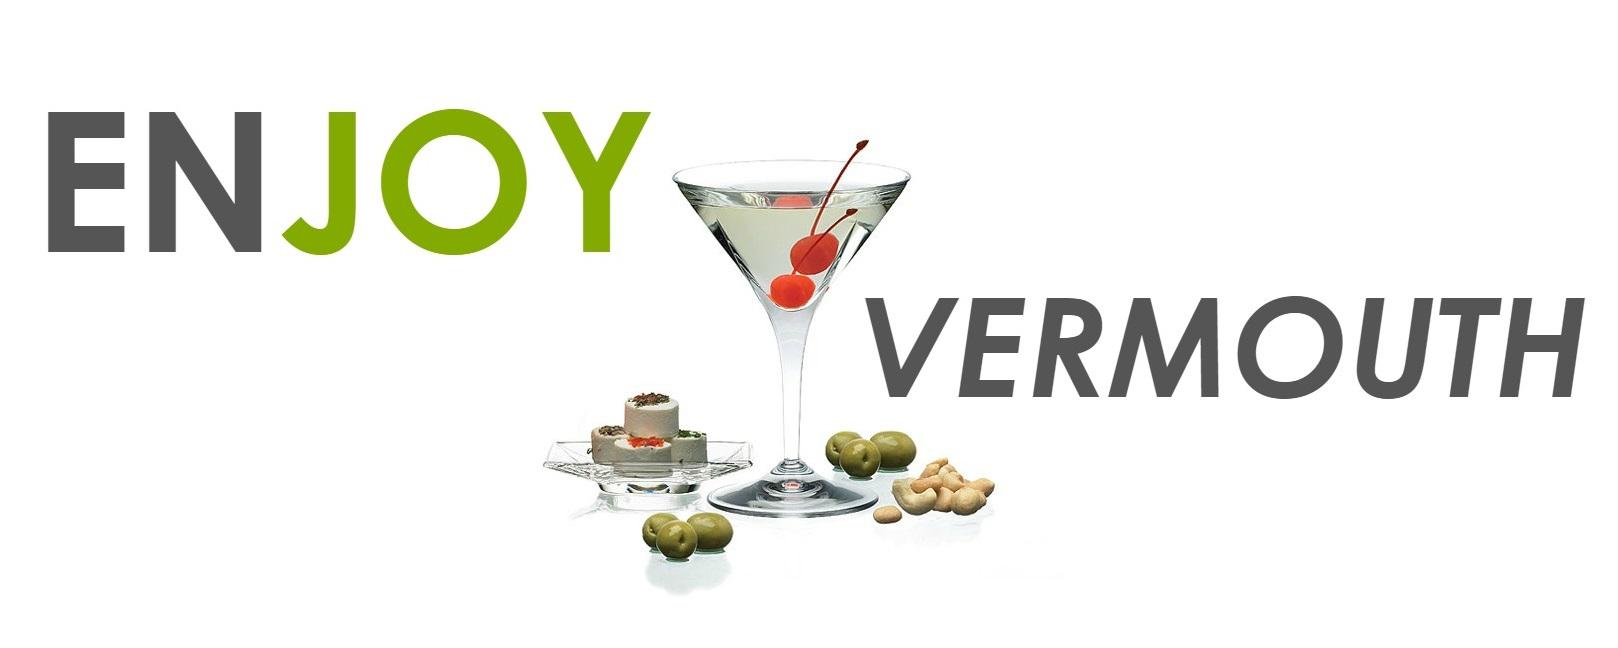 ENJOY-VERMOUTH-IN-BARCELONA-VISIT-APARTMENT-APARTEASY